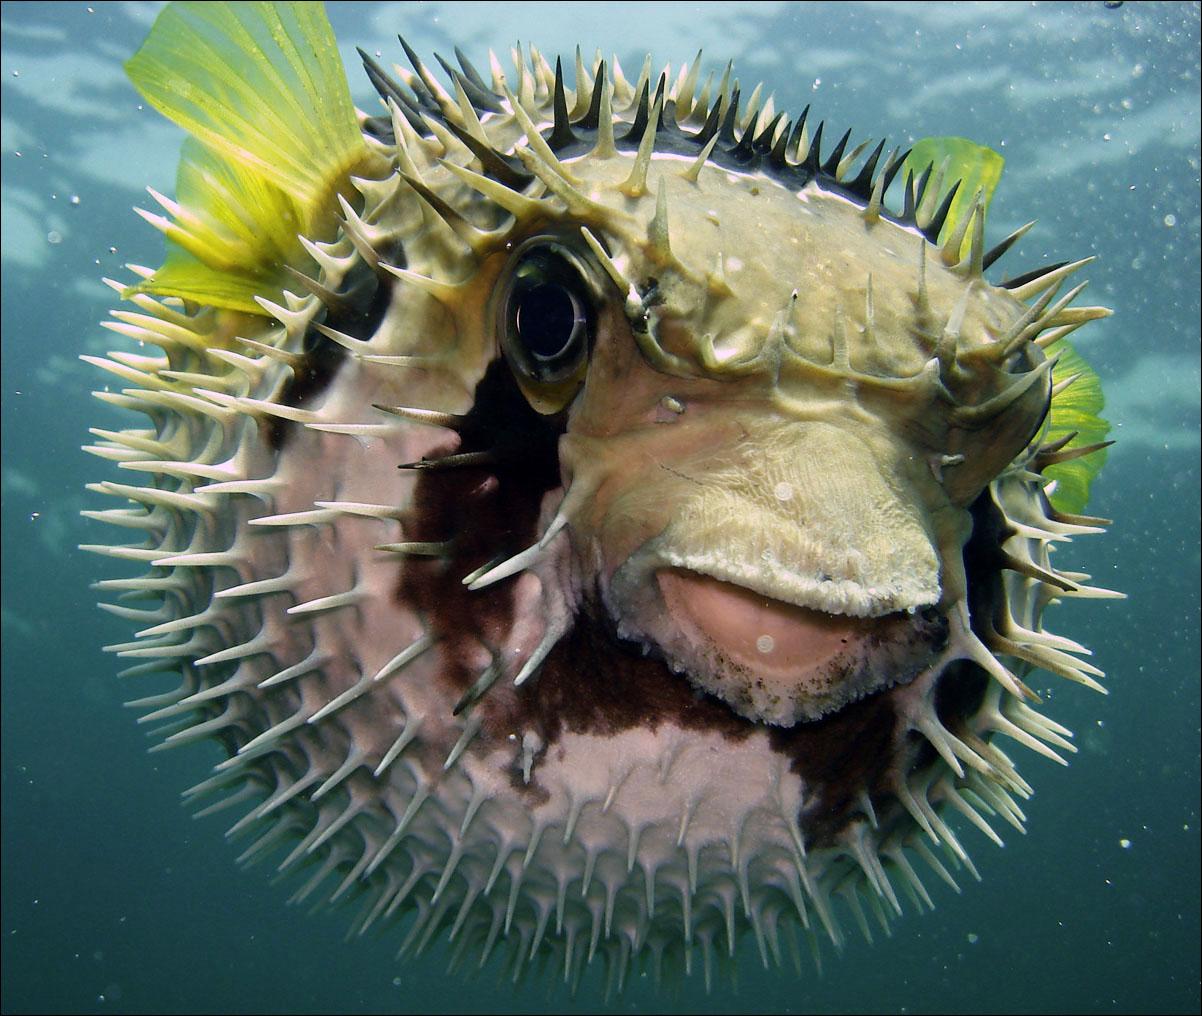 giant puffer fish puffed up - photo #31